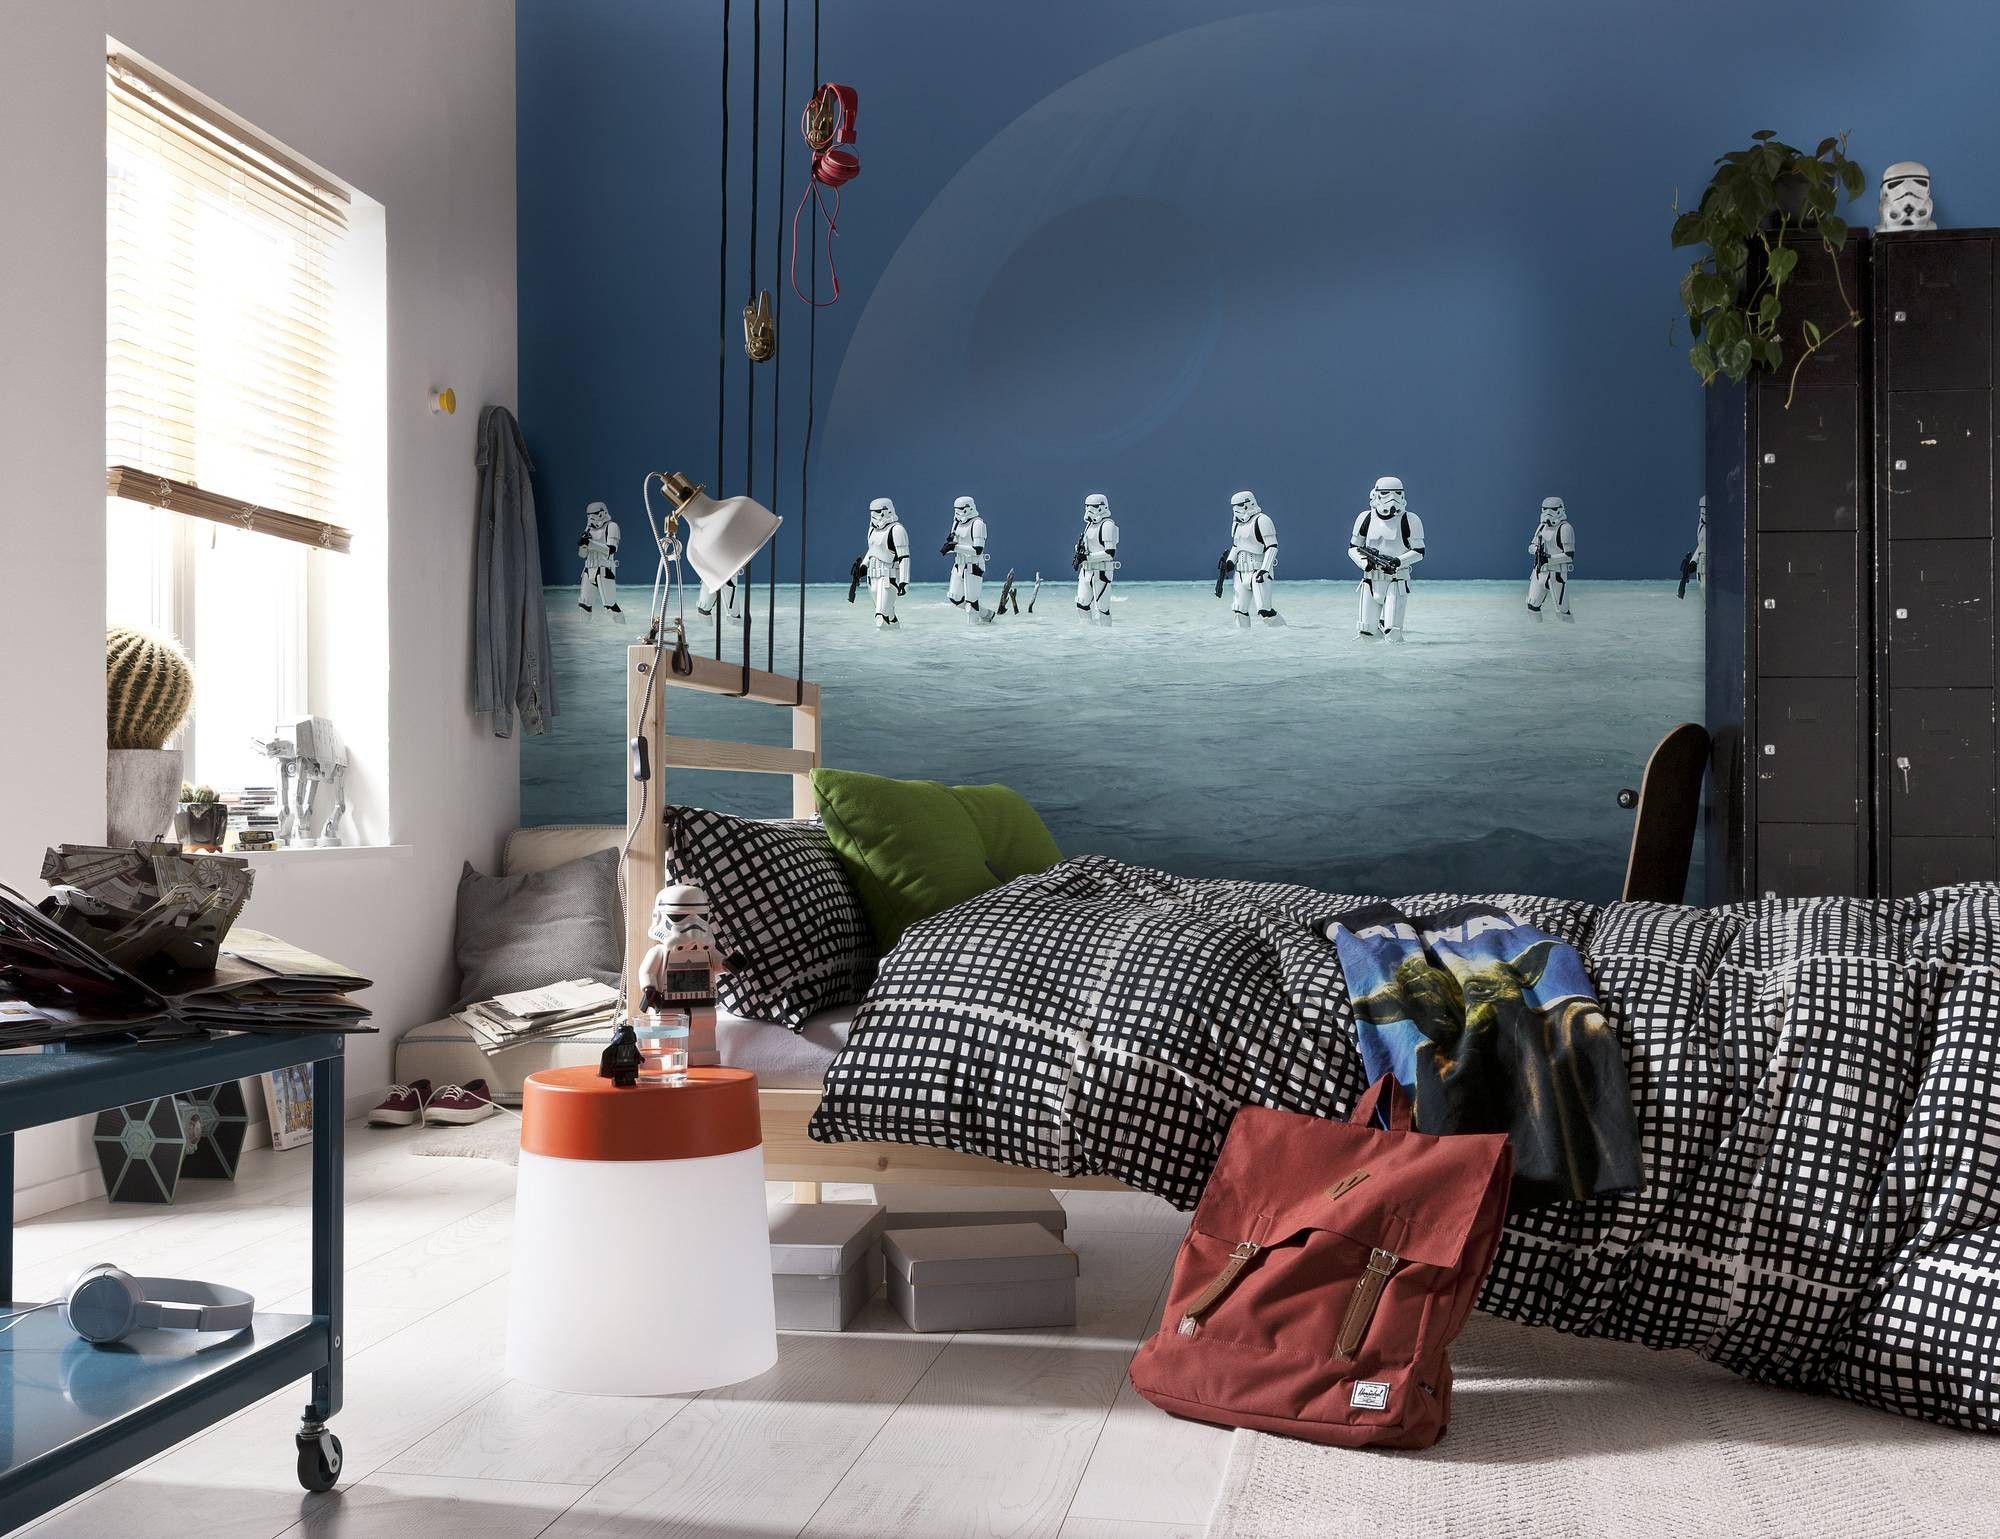 Star Wars Wall Mural 2000x1539 Download Hd Wallpaper Wallpapertip